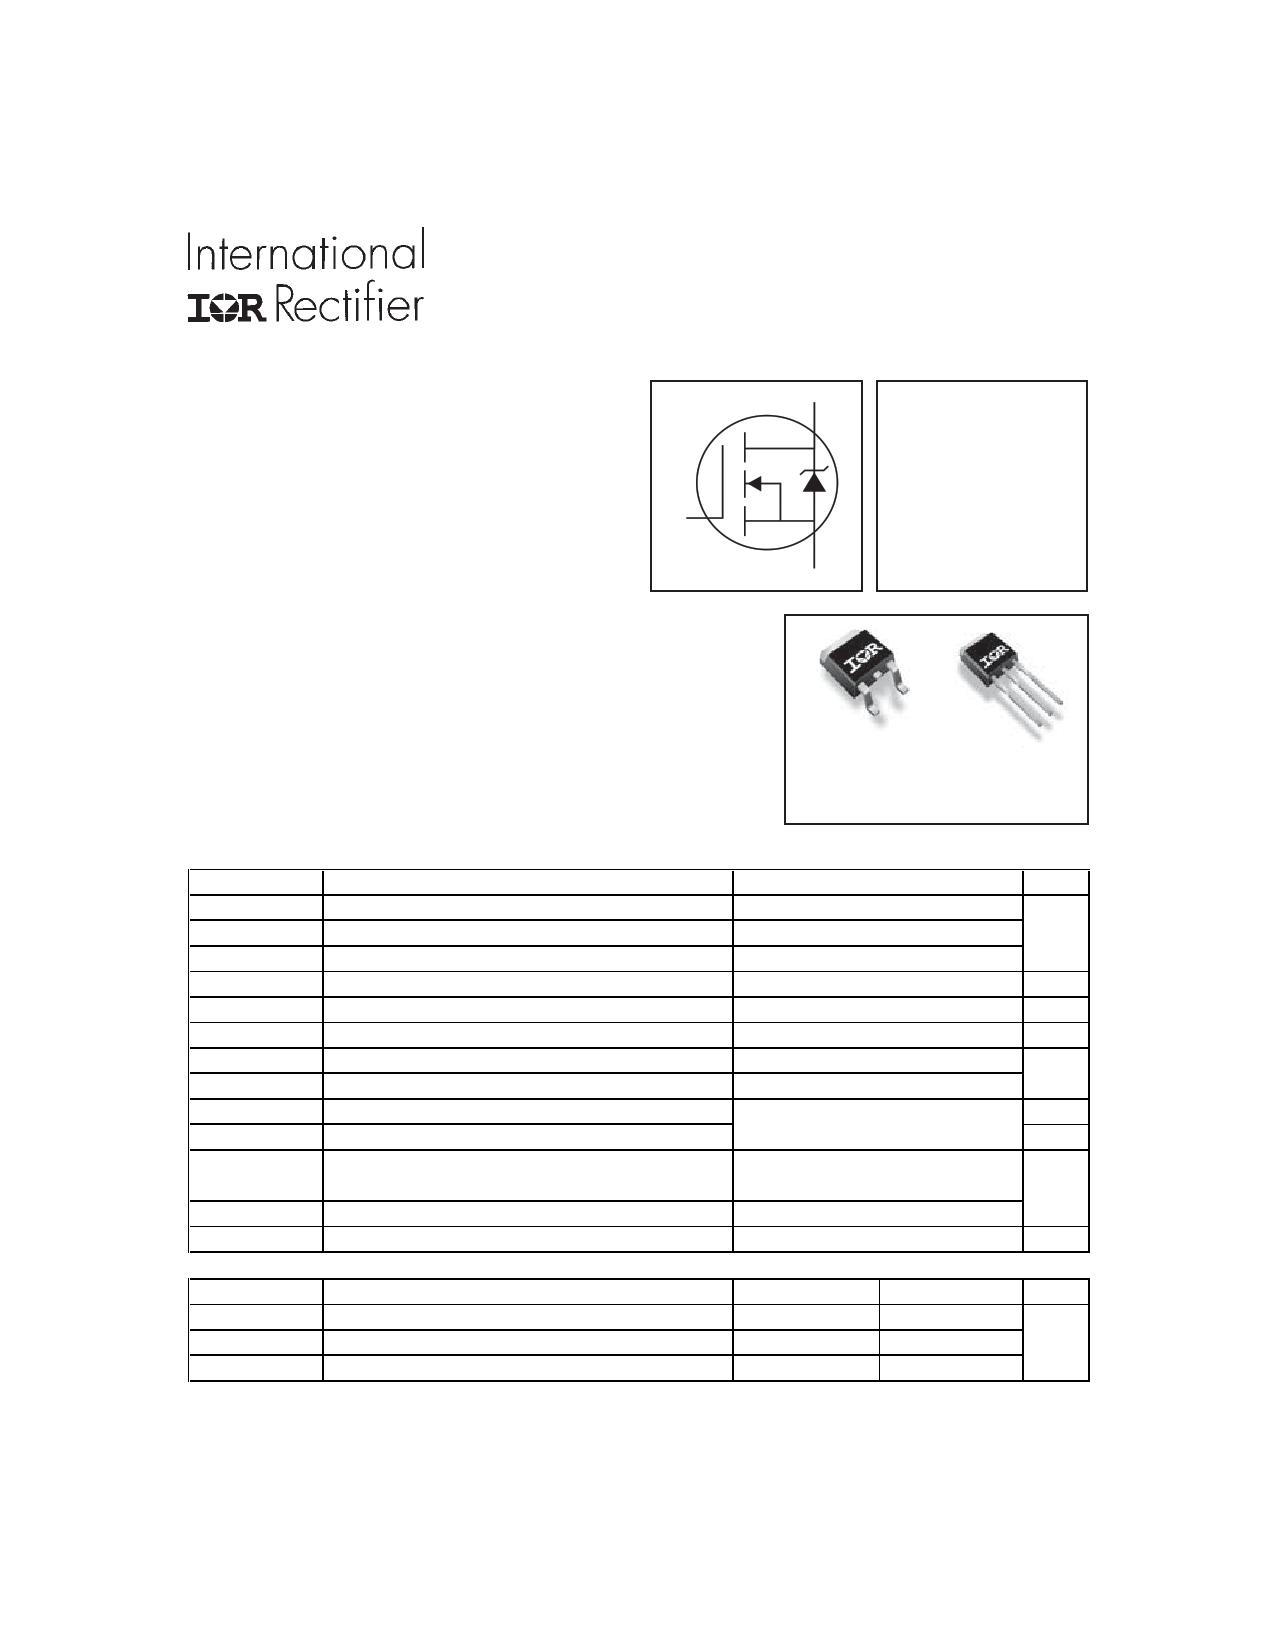 IRFR120Z Datasheet, IRFR120Z PDF,ピン配置, 機能